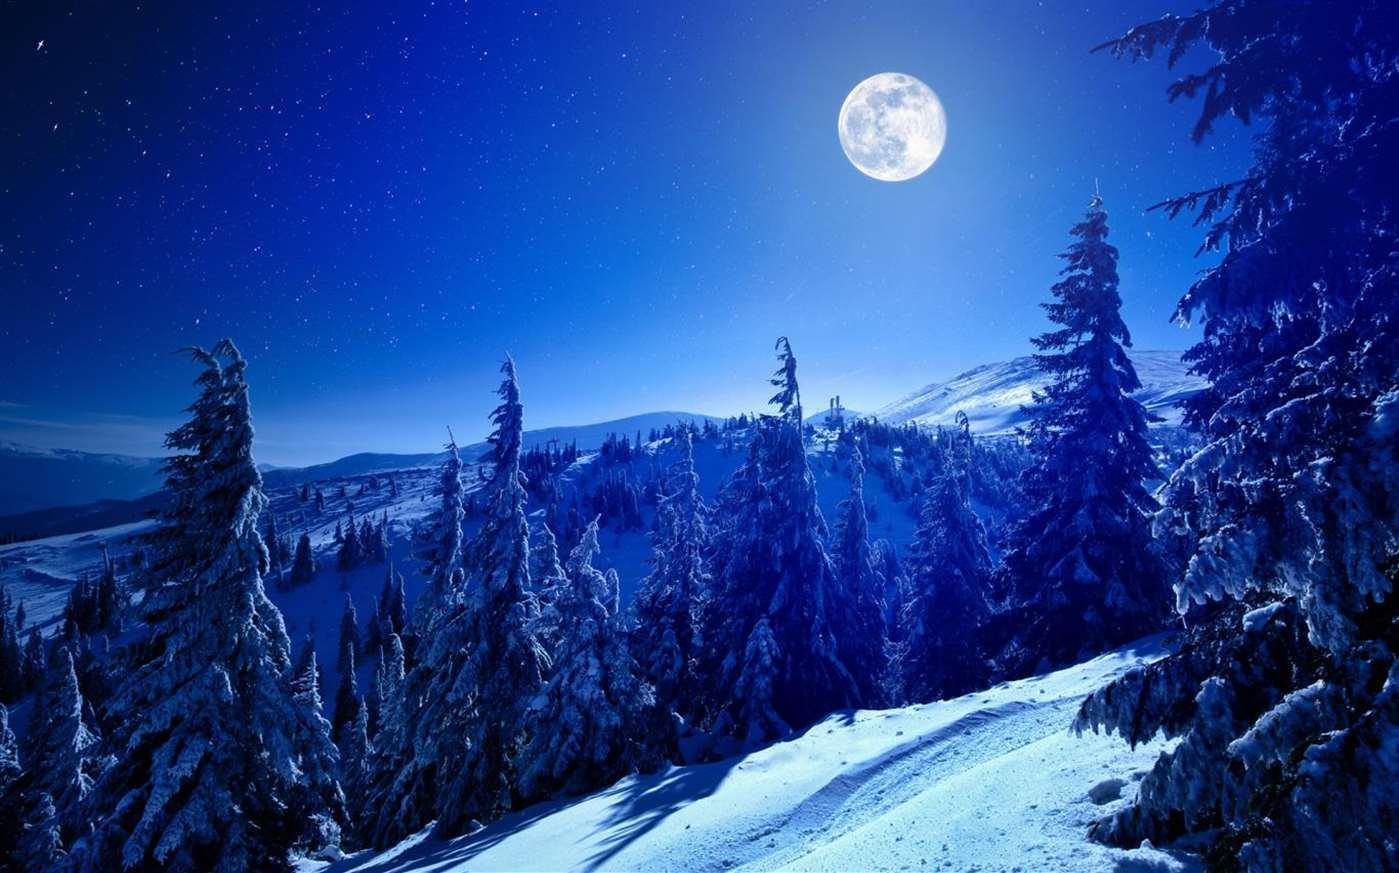 Win10发布最新主题:雪山 冰冻的艺术 罂粟花地带 天际之上